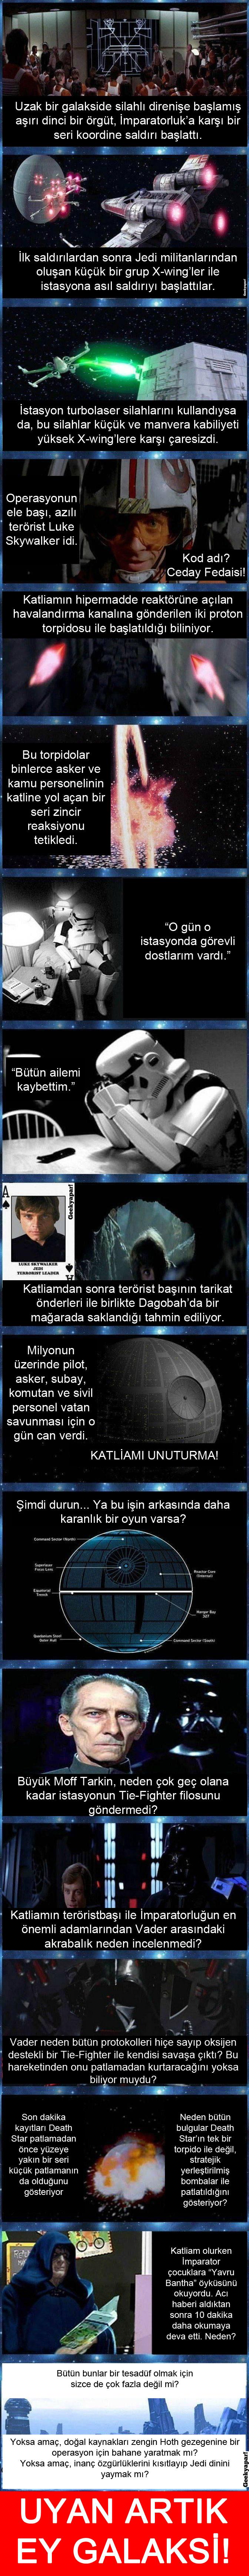 death_star_komplosu_geekyapar